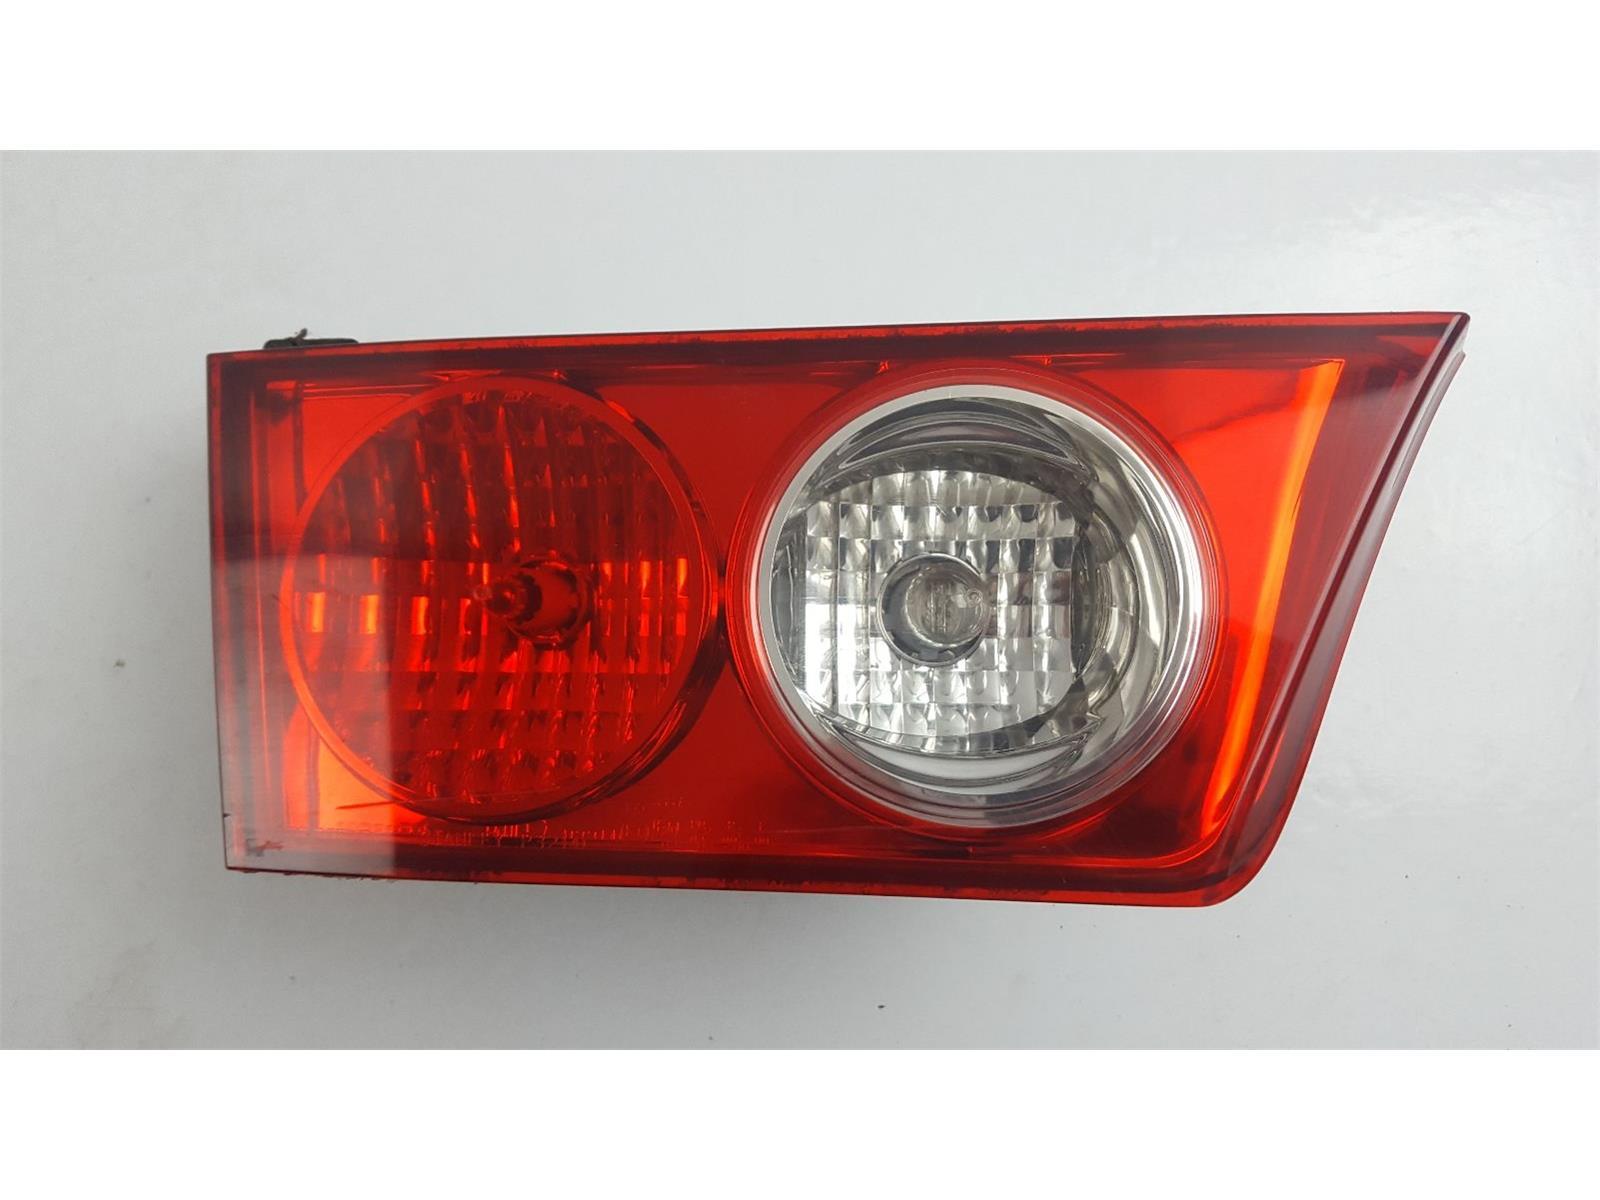 Honda Accord 2003 To 2005 Lamp Assembly Rear Lh Petrol Manual Tail Light 2004 Mk6 Inner Ns Passenger 34156sea003